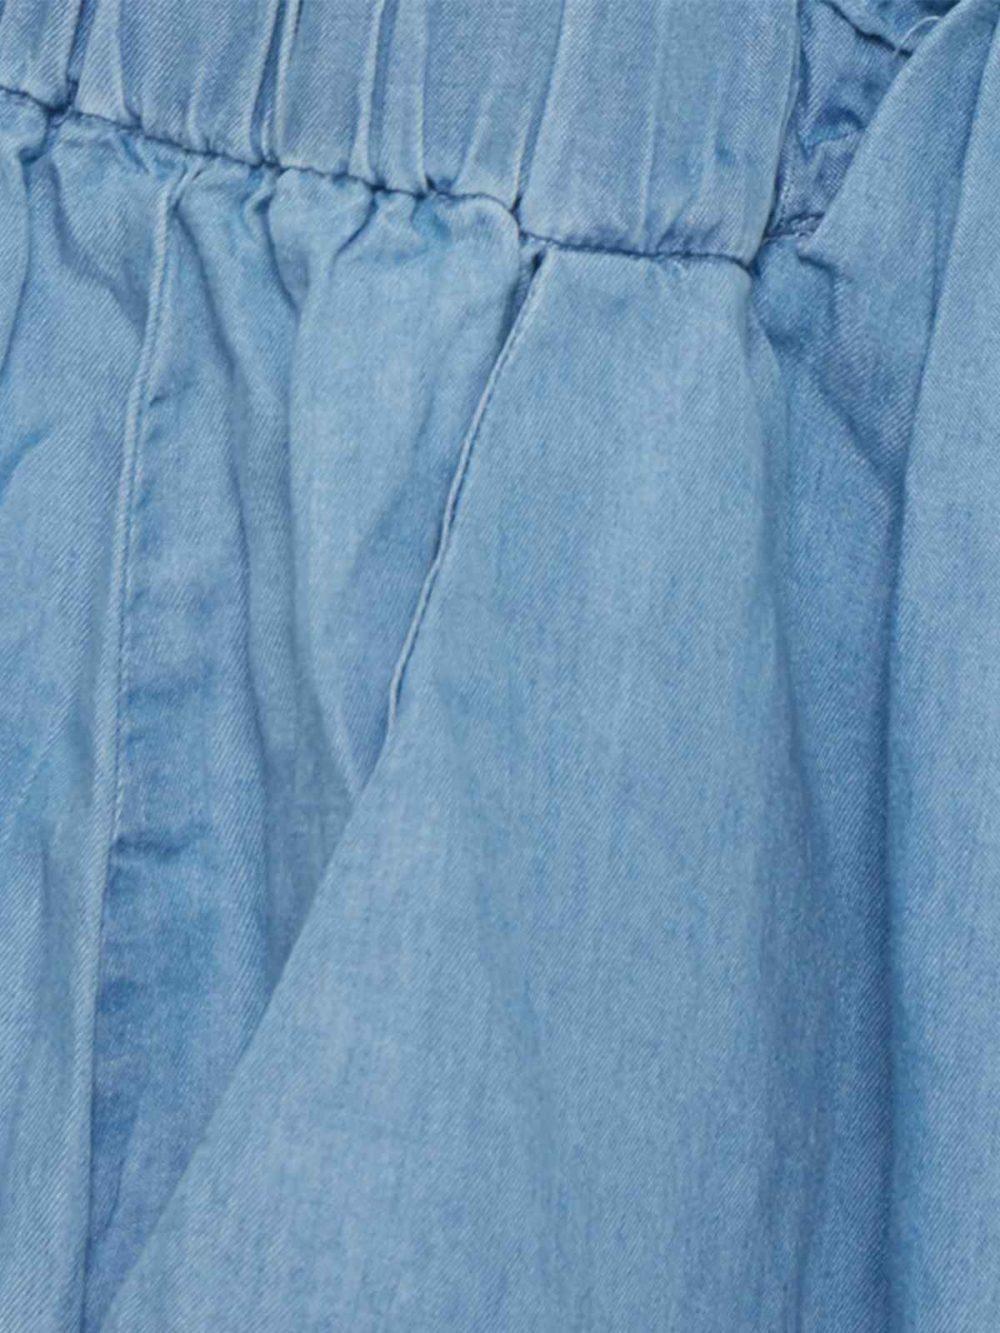 Claza Dress ICHI Katie Kerr Women's Clothing